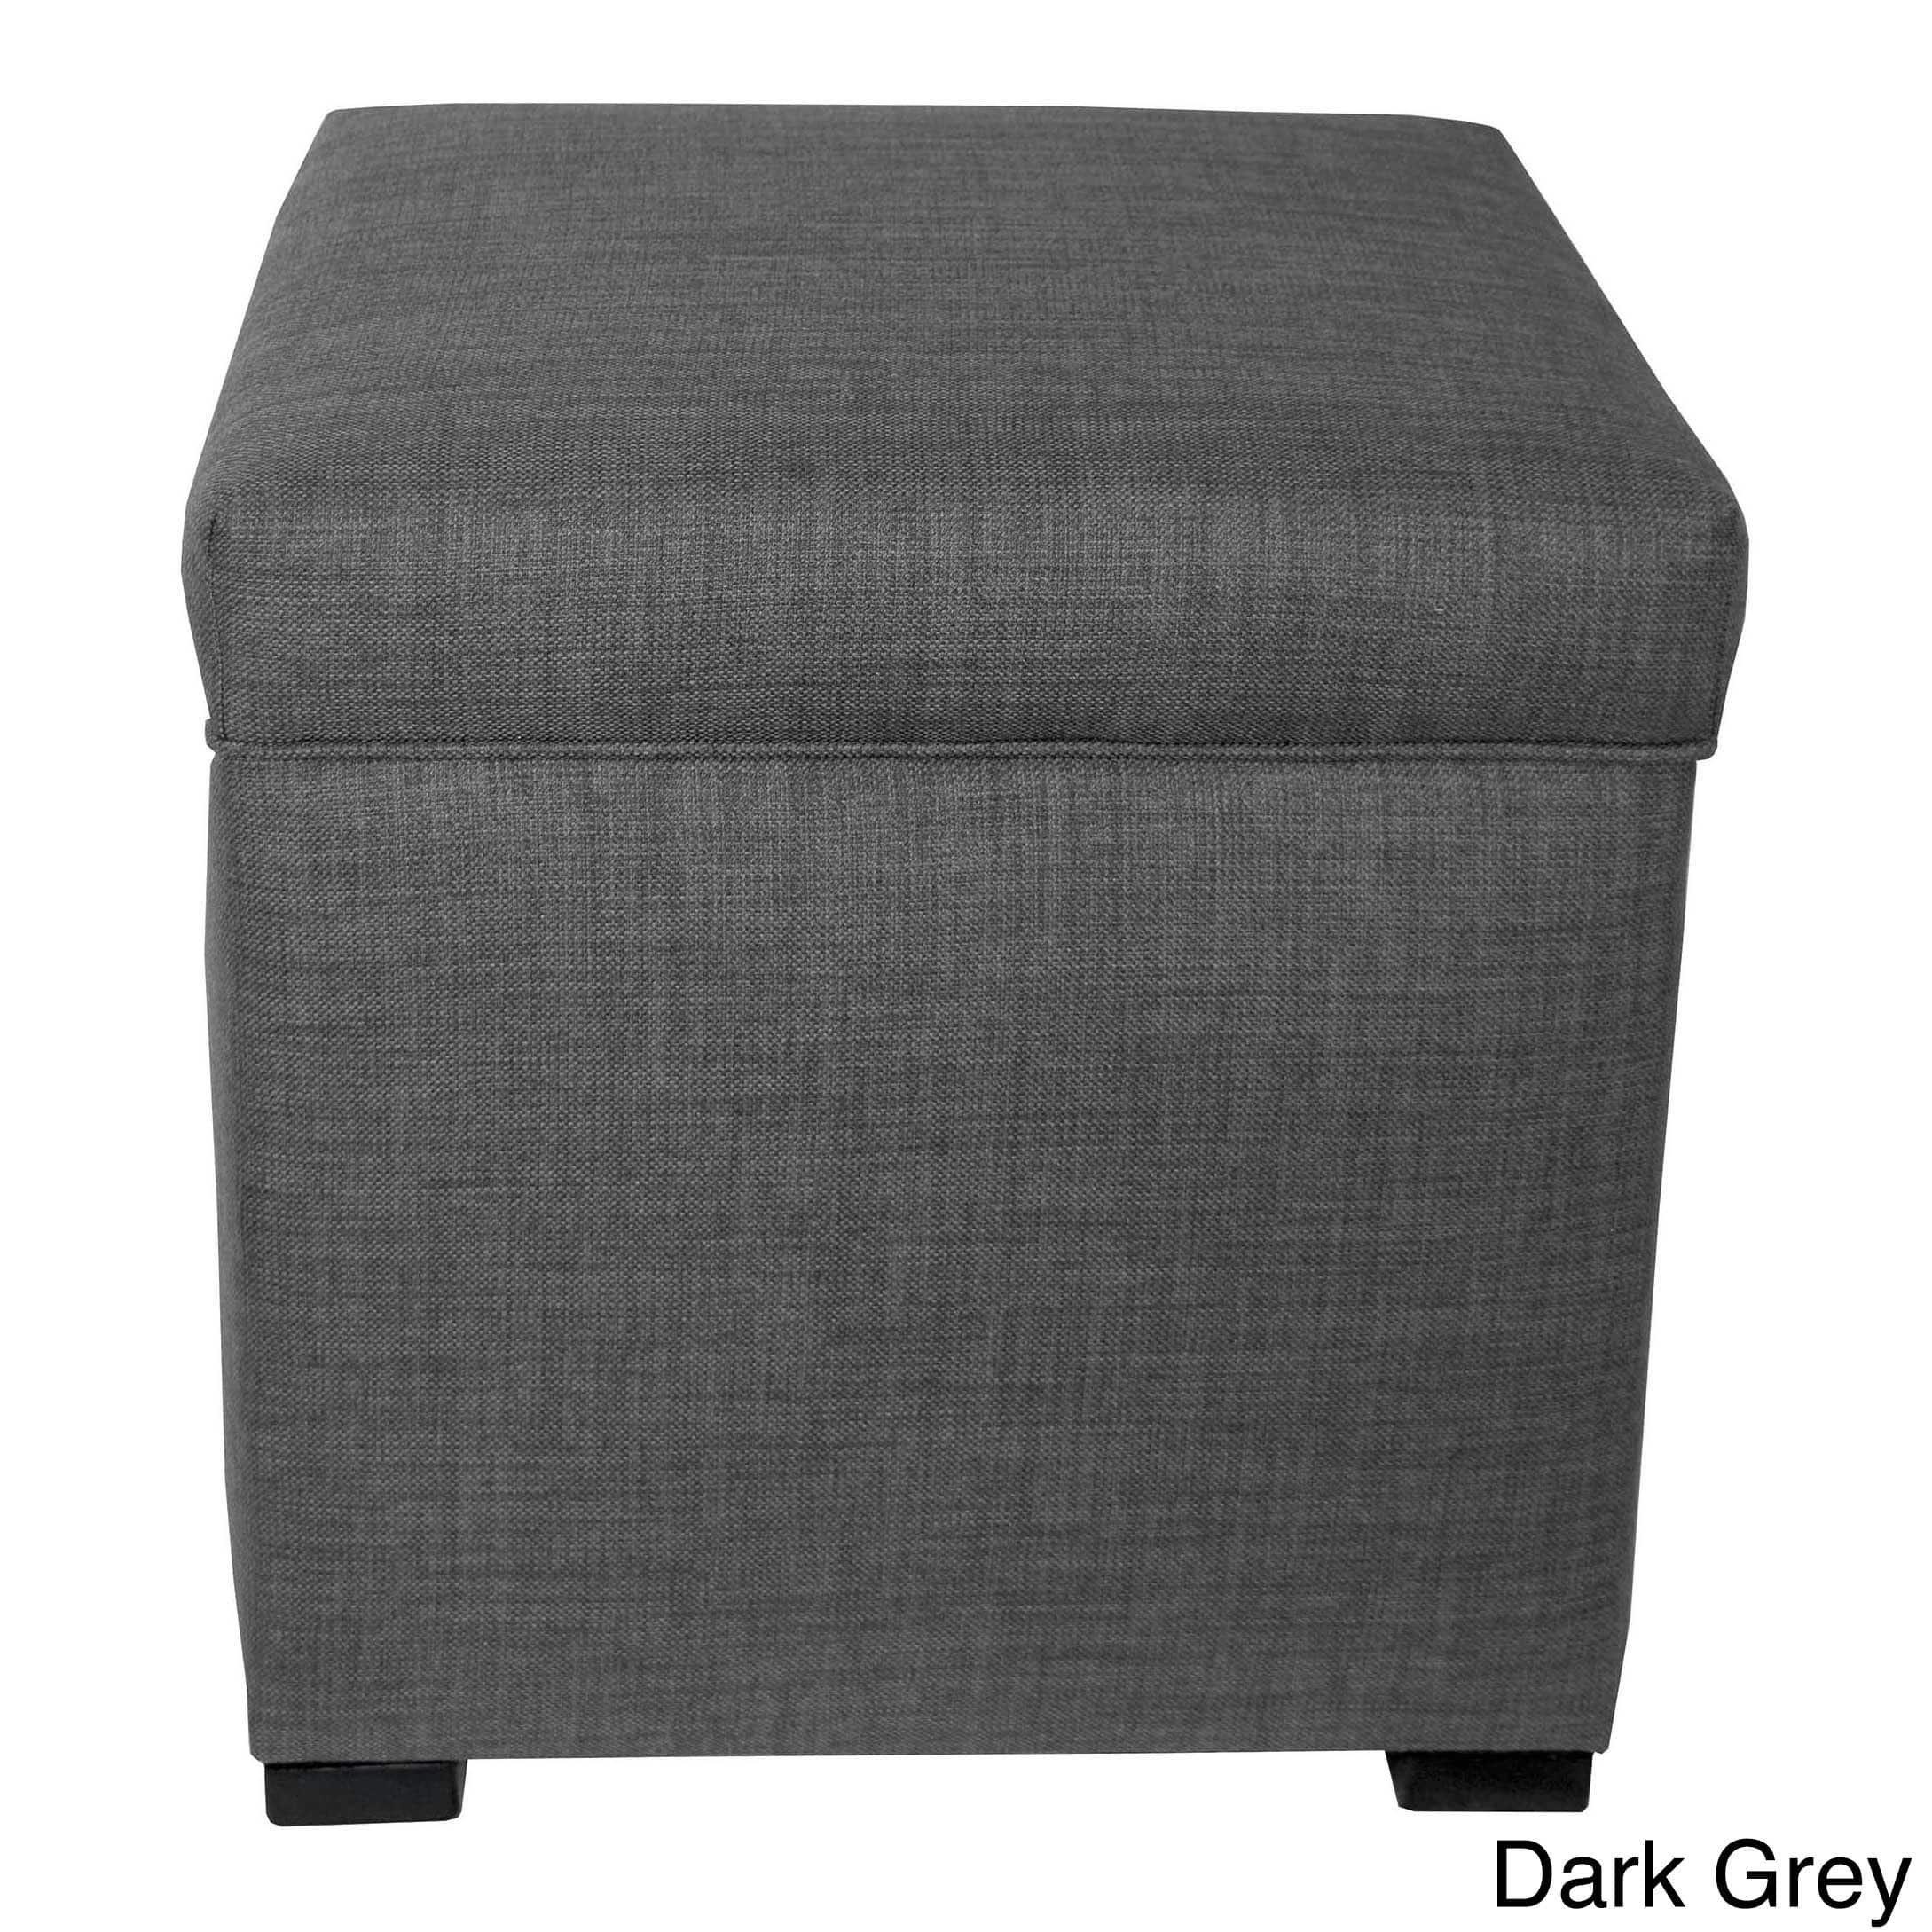 The Sole Secret Mini Shoe Storage Ottoman, 18.5''L x 19''H x 19''W, Dark Grey